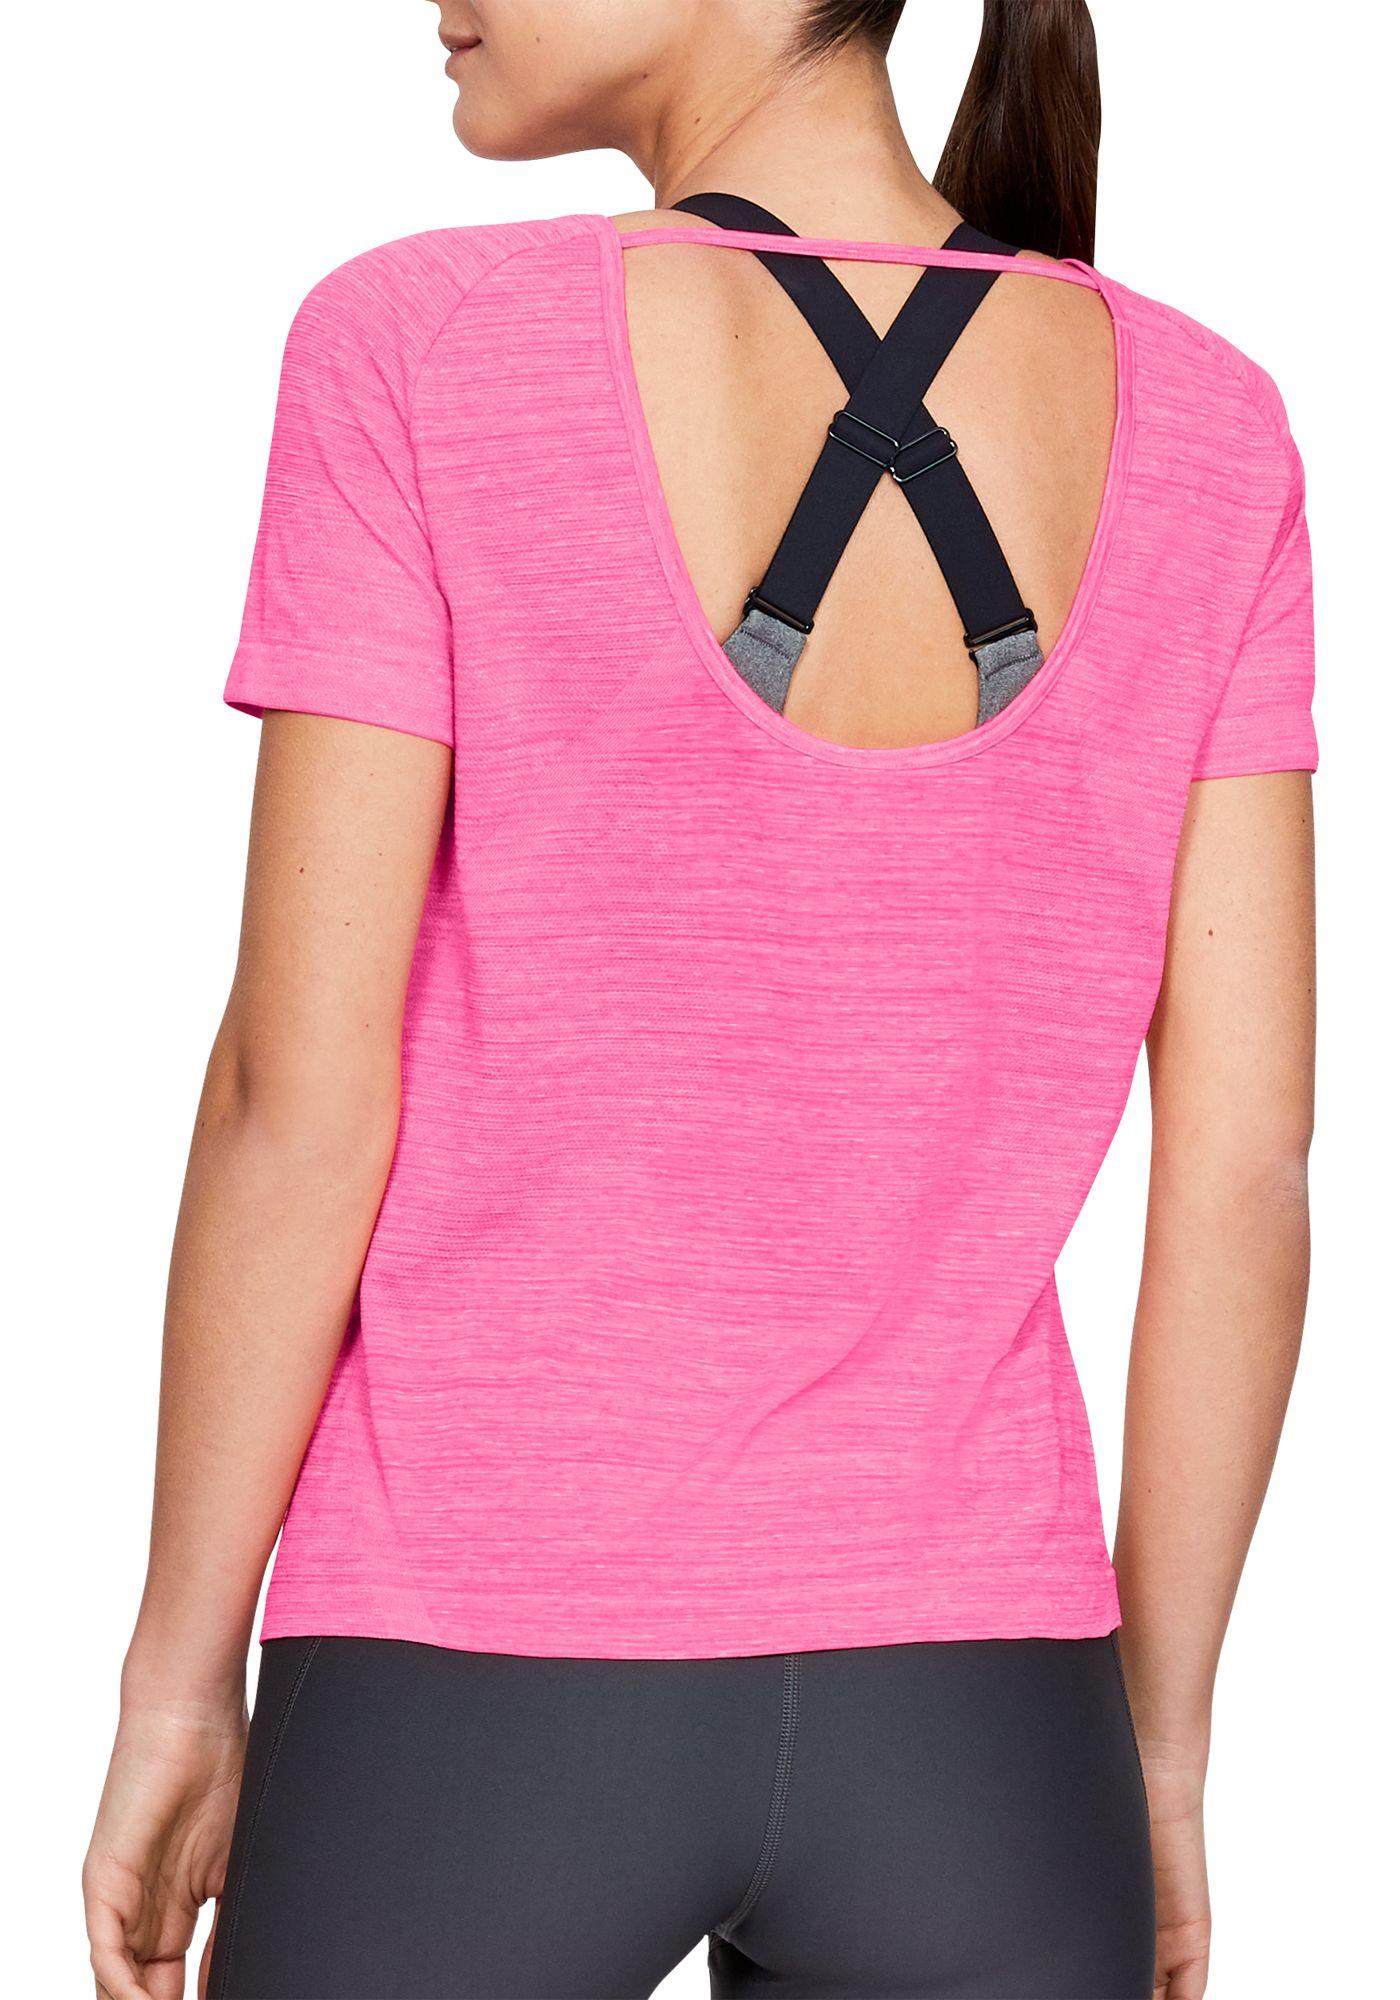 Under Armour Women's Vanish Seamless Spacedye Keyhole T-Shirt